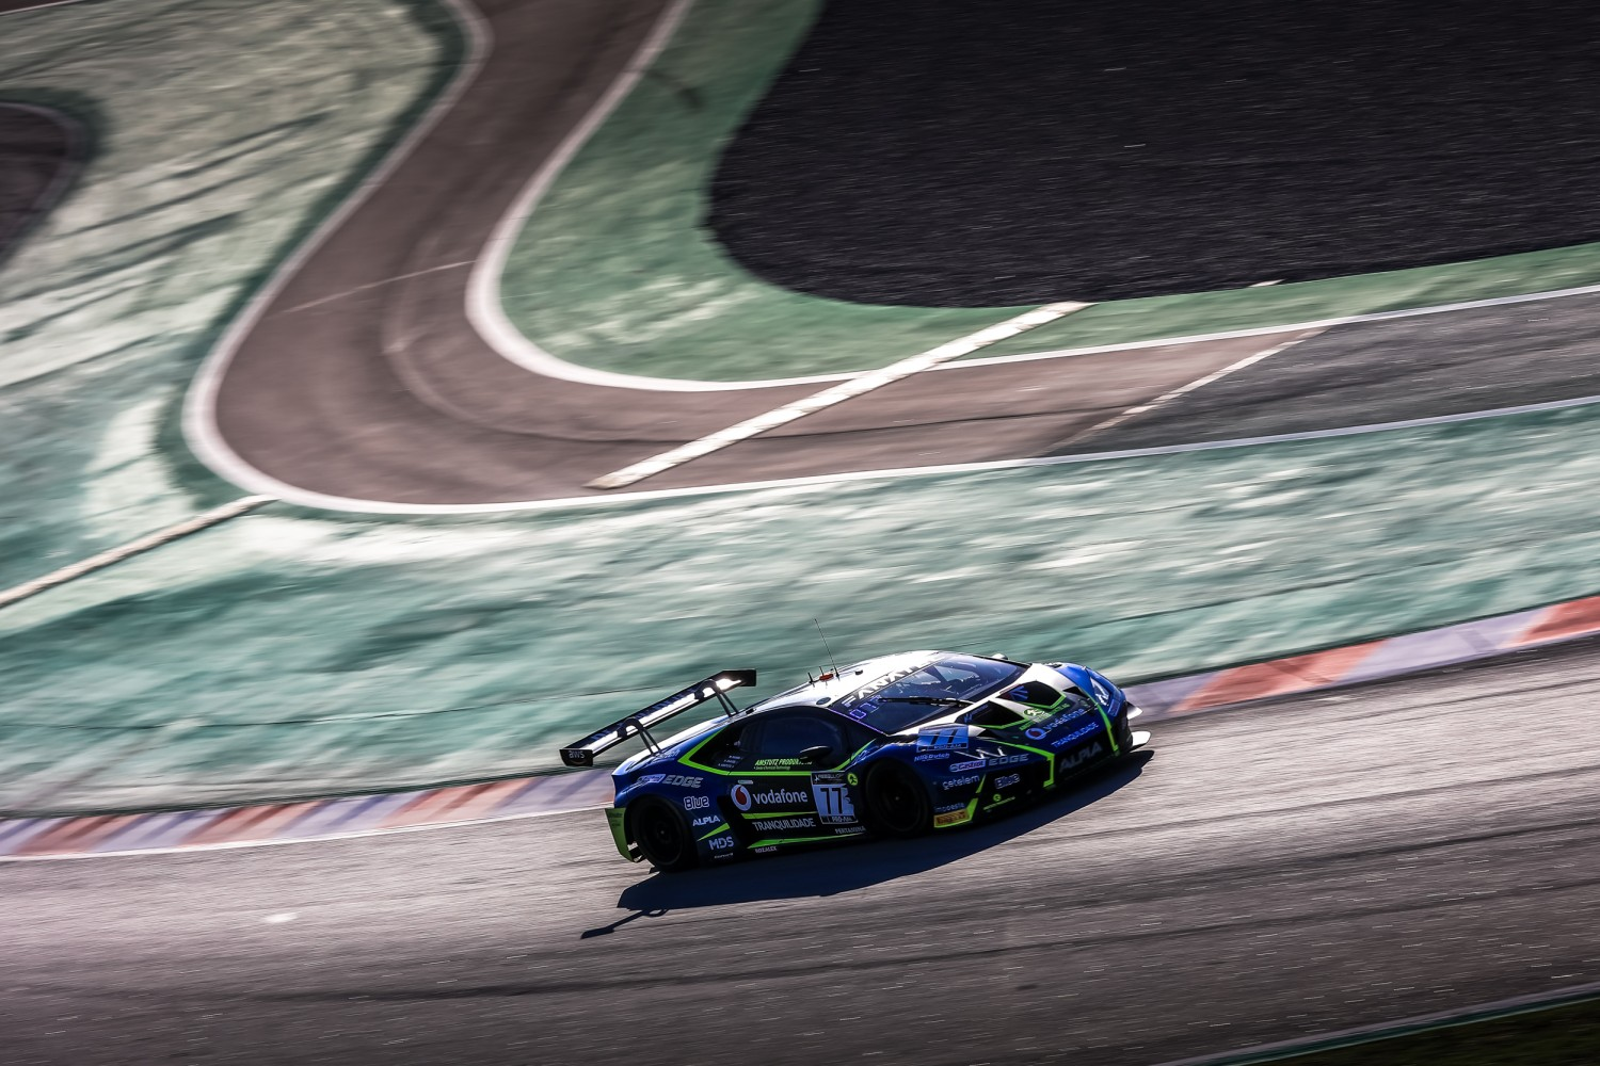 Season finale kicks off with busy day of track activity at Circuit de Barcelona-Catalunya